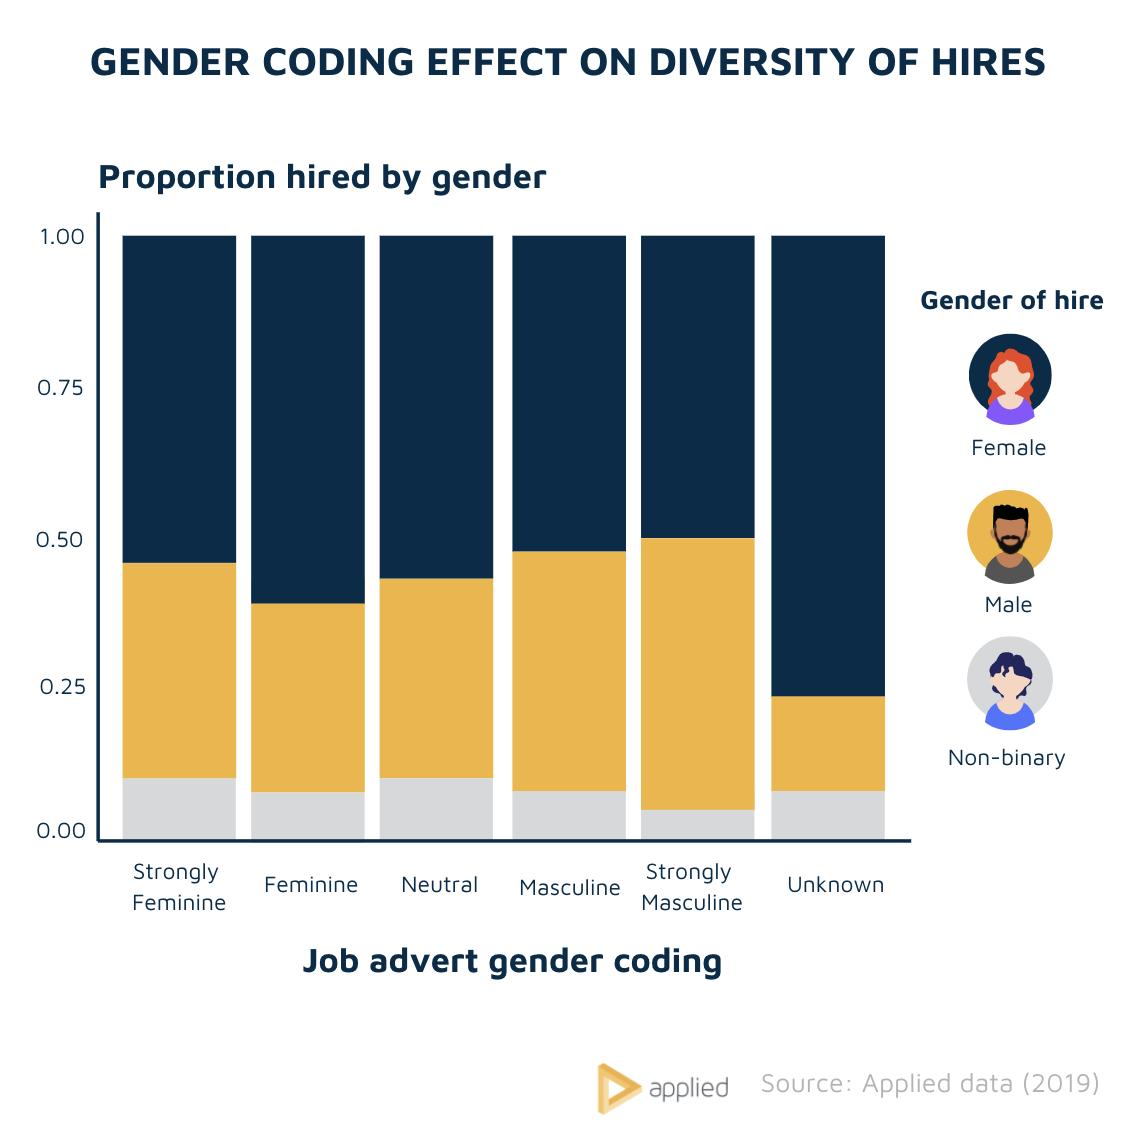 Gender coding vs diversity of hires